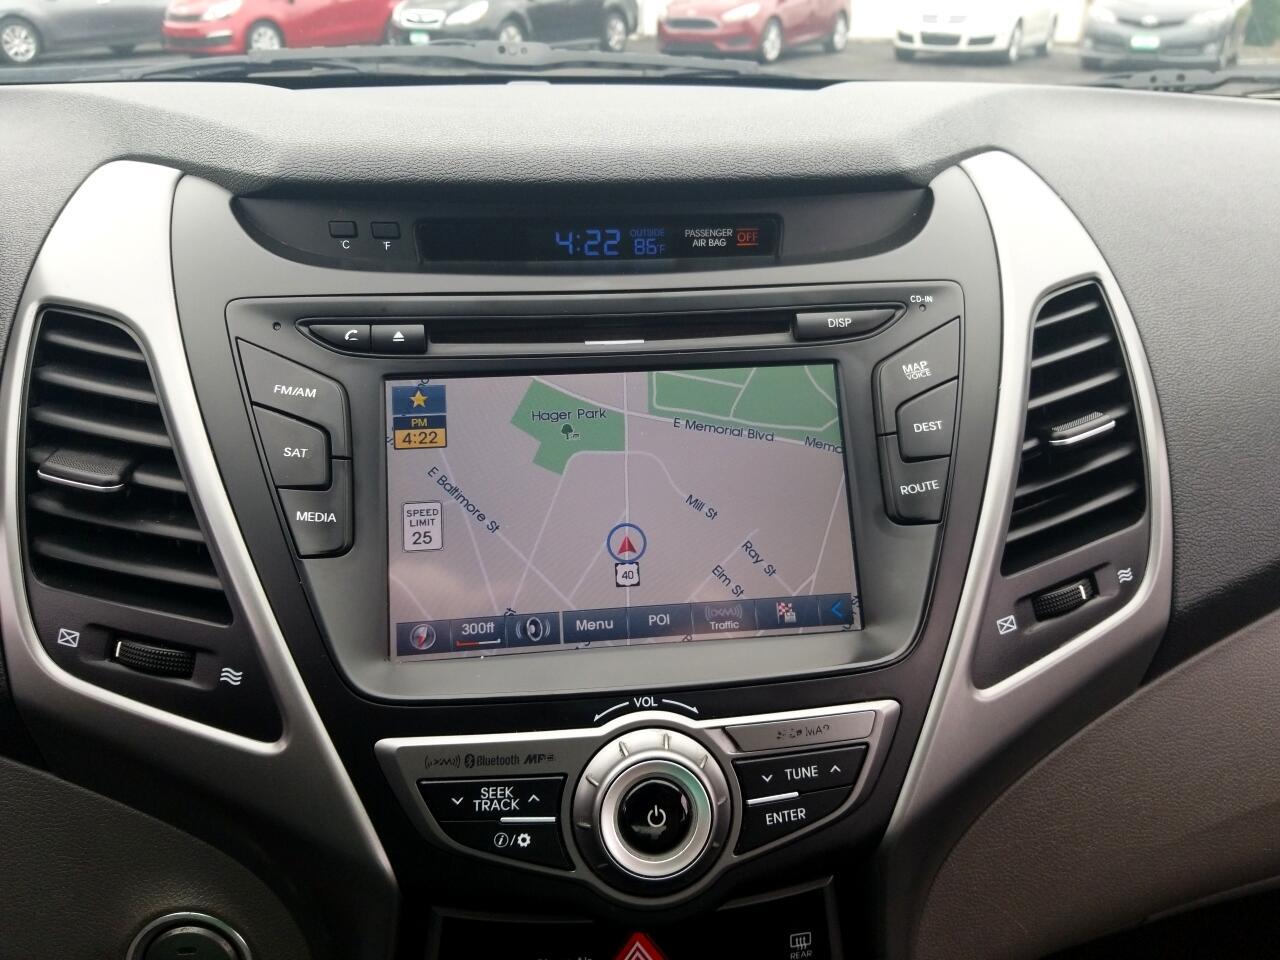 2014 Hyundai Elantra 4dr Sdn Auto GLS